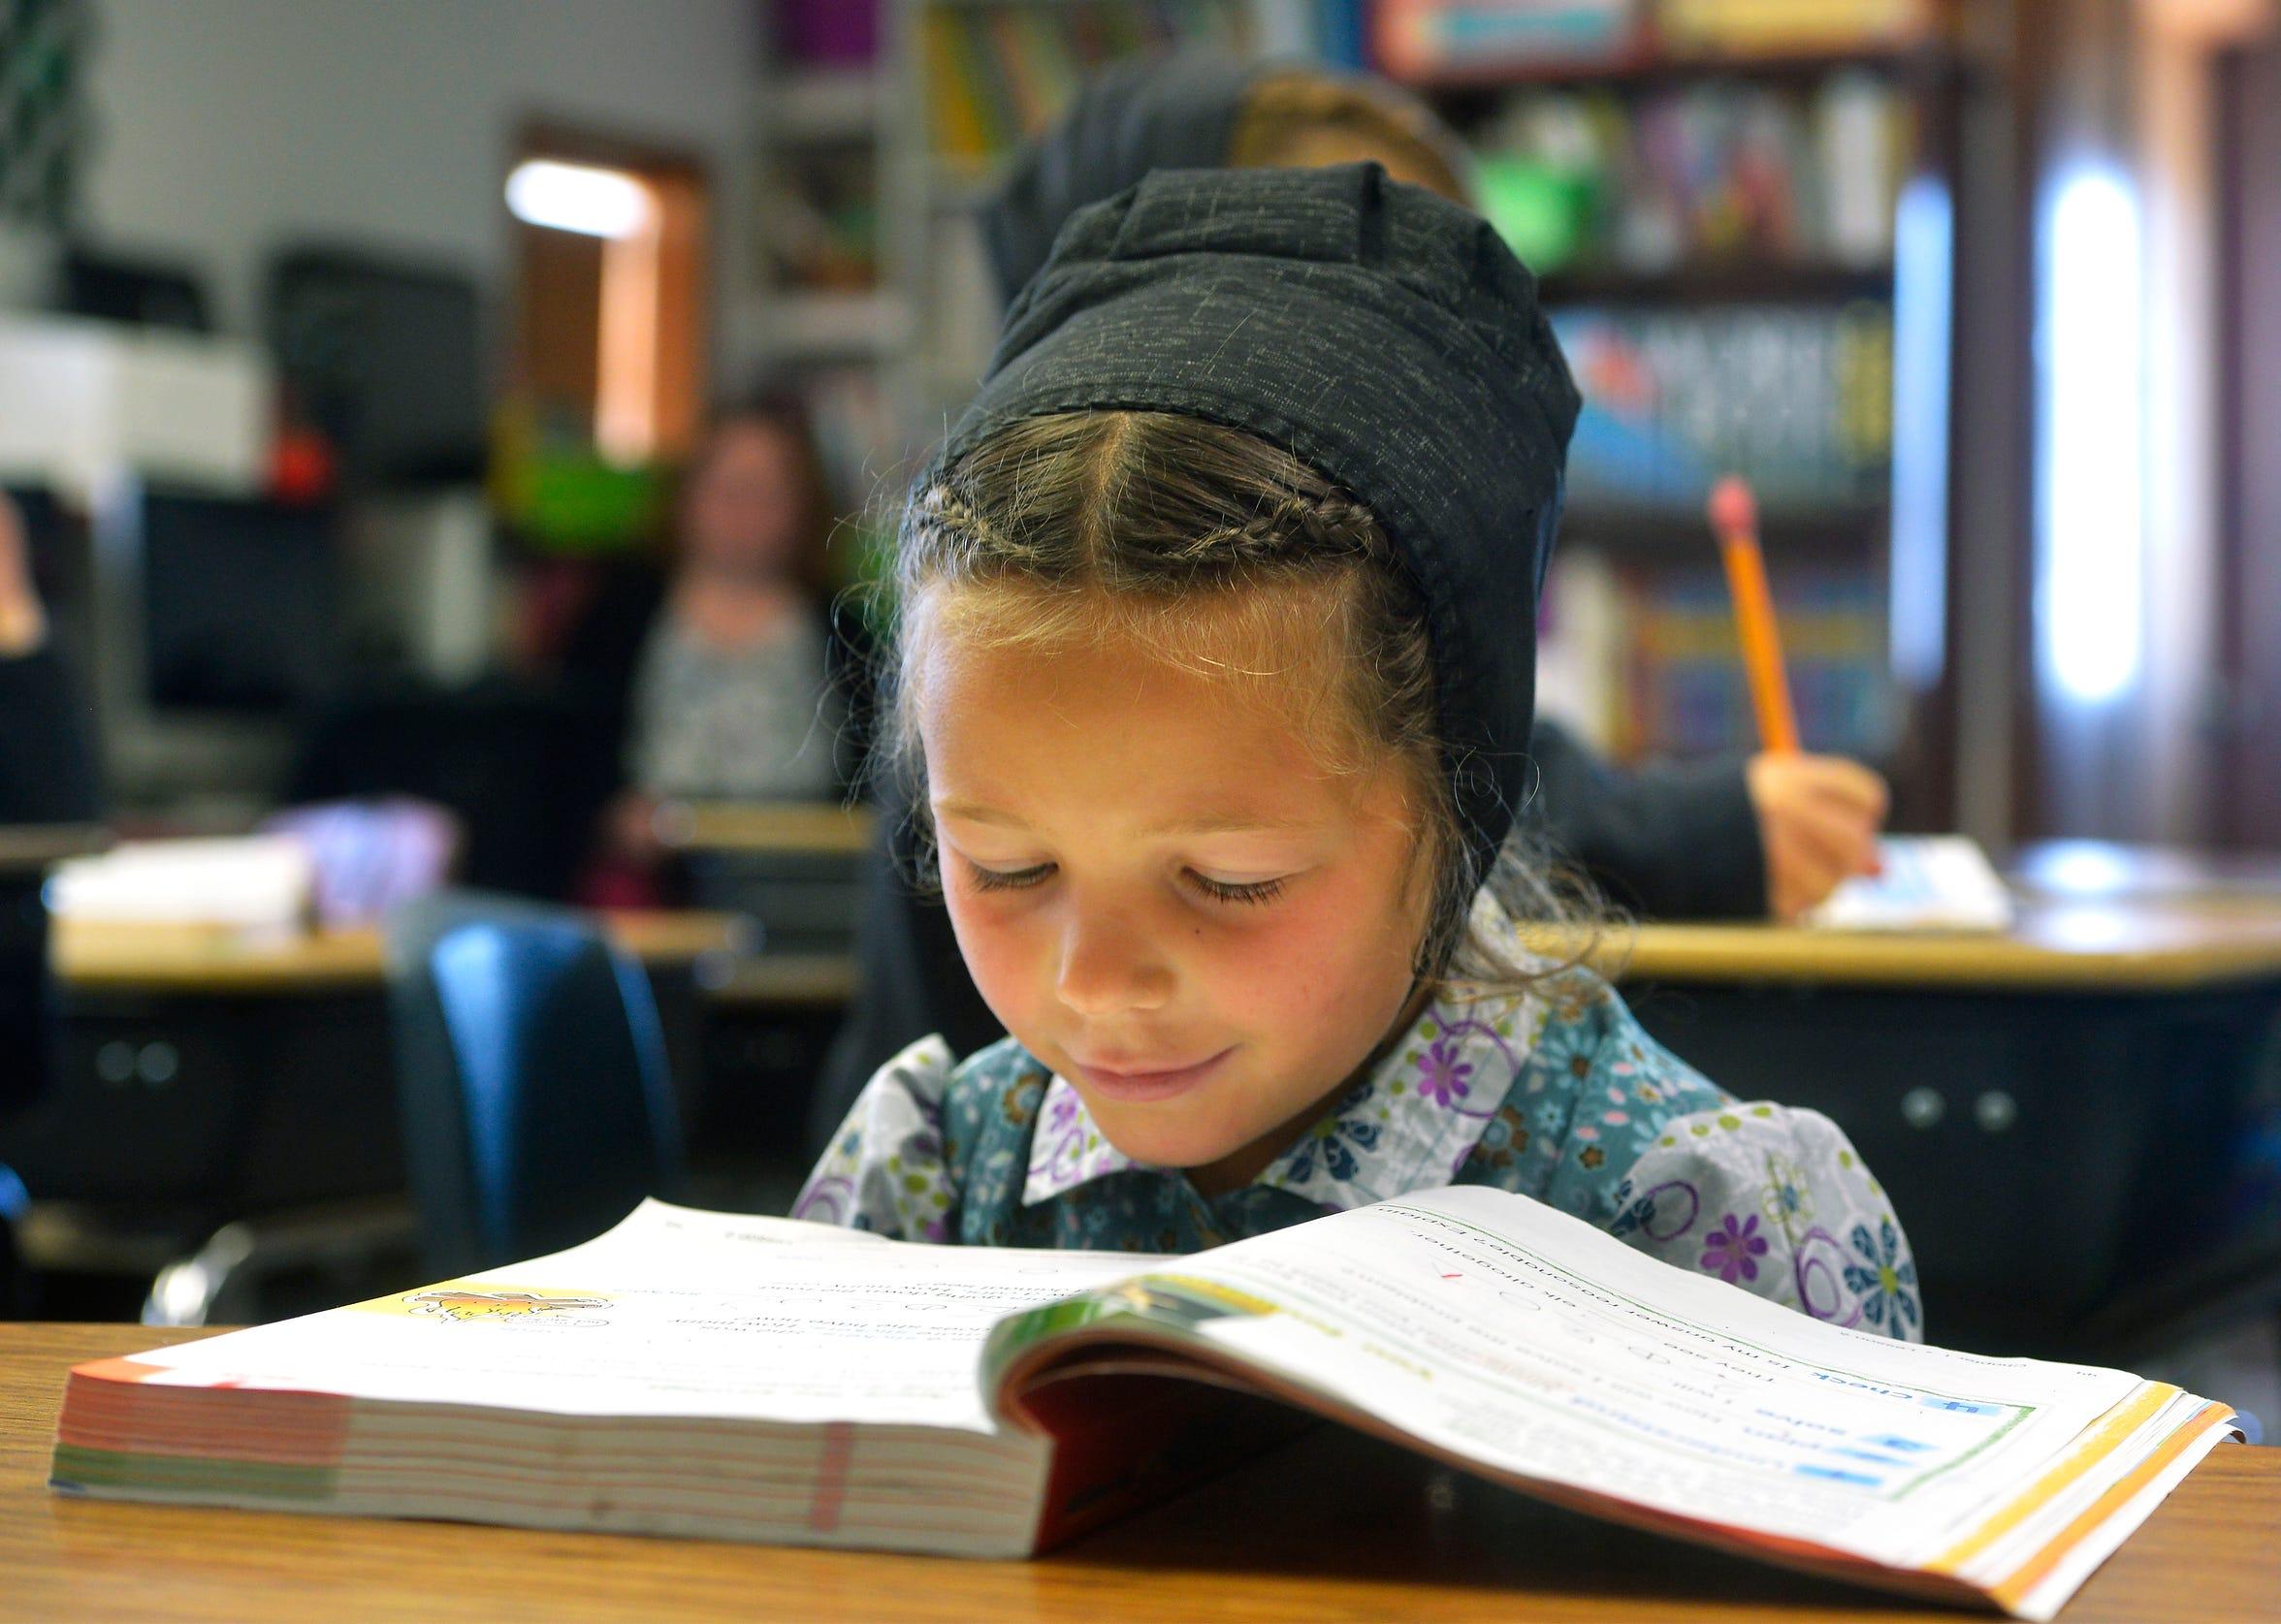 Amber Stahl reads at her desk at Deerfield School.